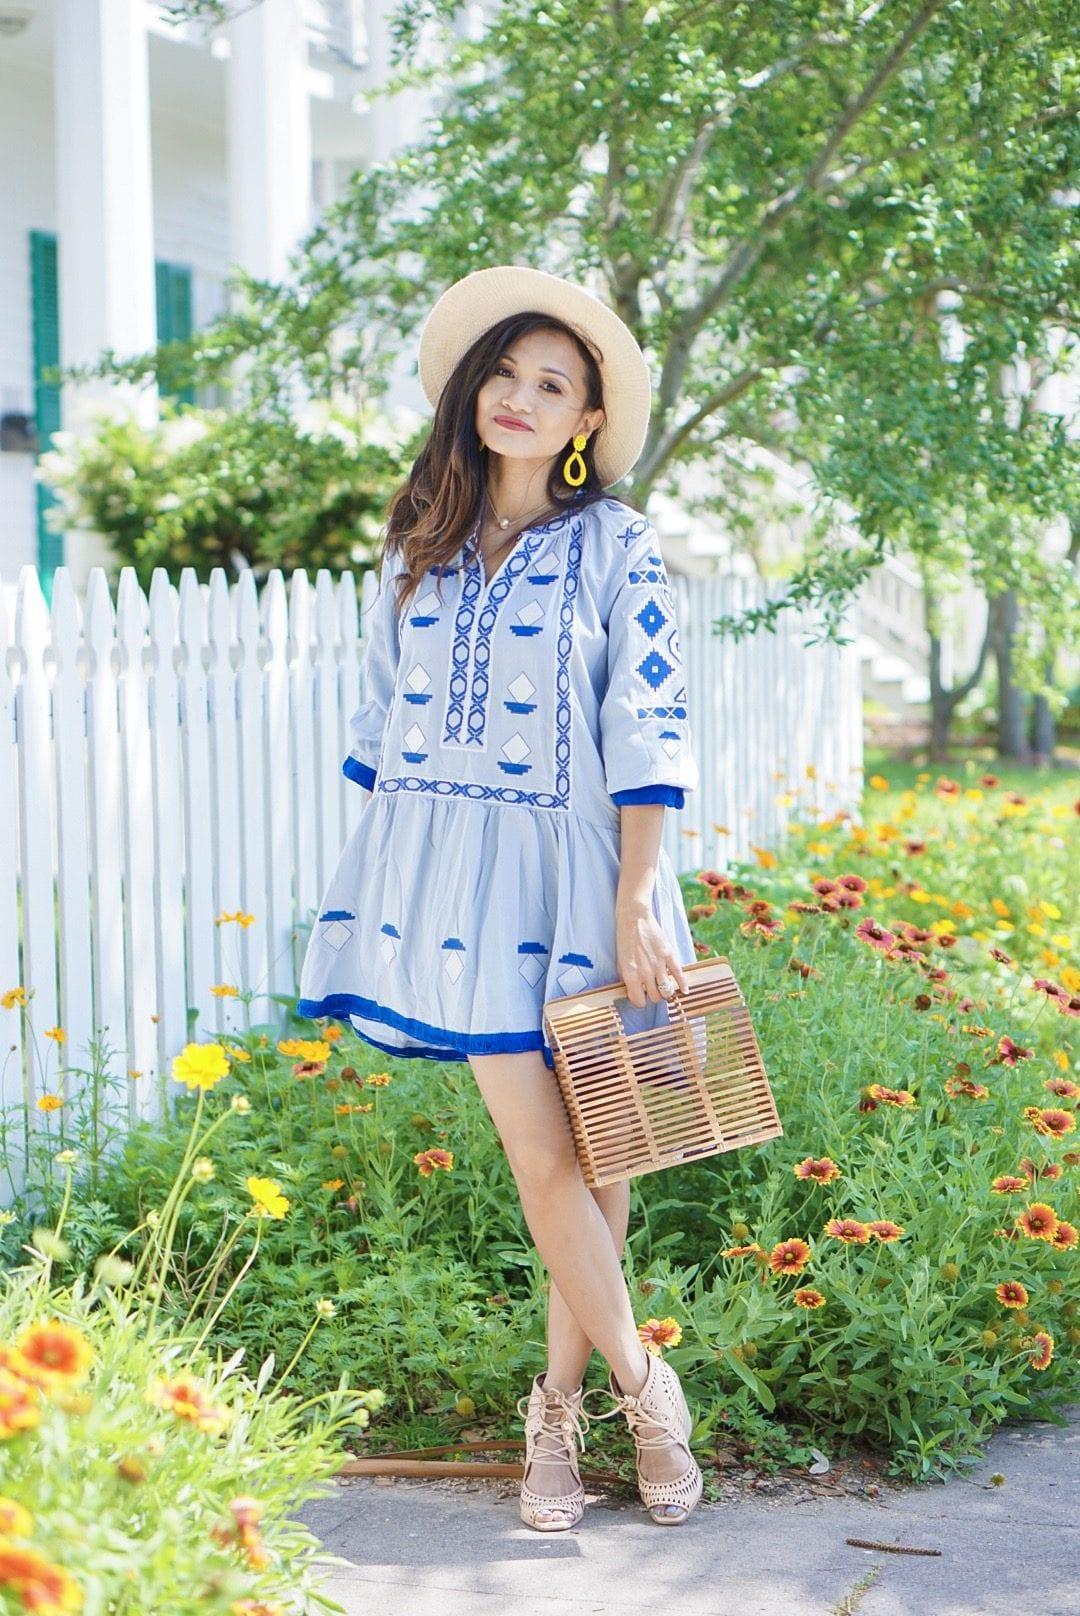 #springstyle #springfashion #summerdress #summerfashion, chicwish, Jeffrey Cambell Rodillo wedges, embroidered dress, bamboo bag, #ltkunder50, #liketoknow.it, blogging tips, rewardstyle, blue dress, beach dress